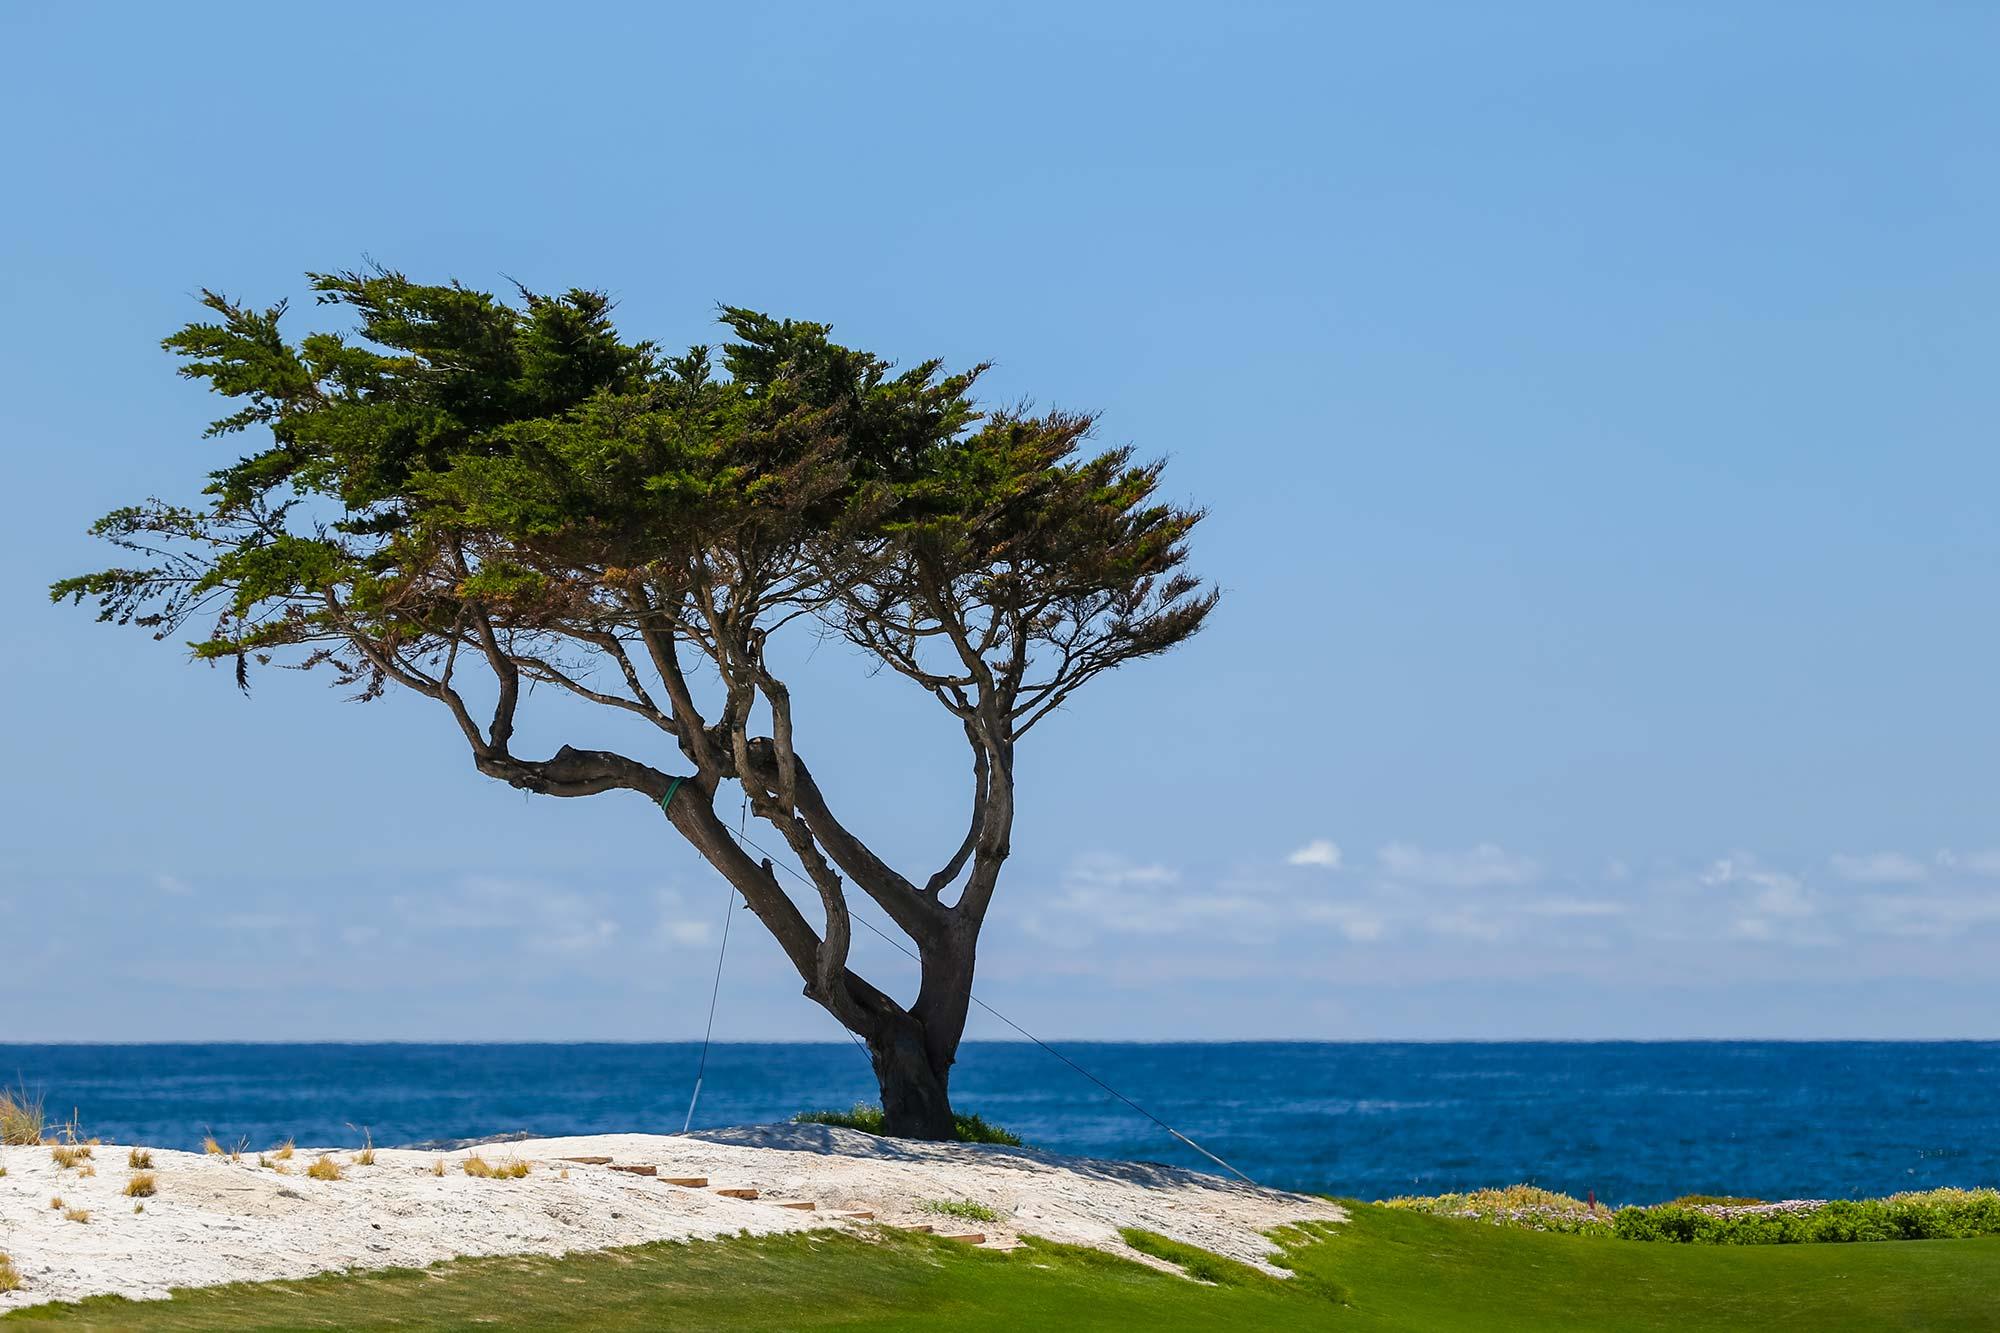 A view of Pebble Beach Golf Course